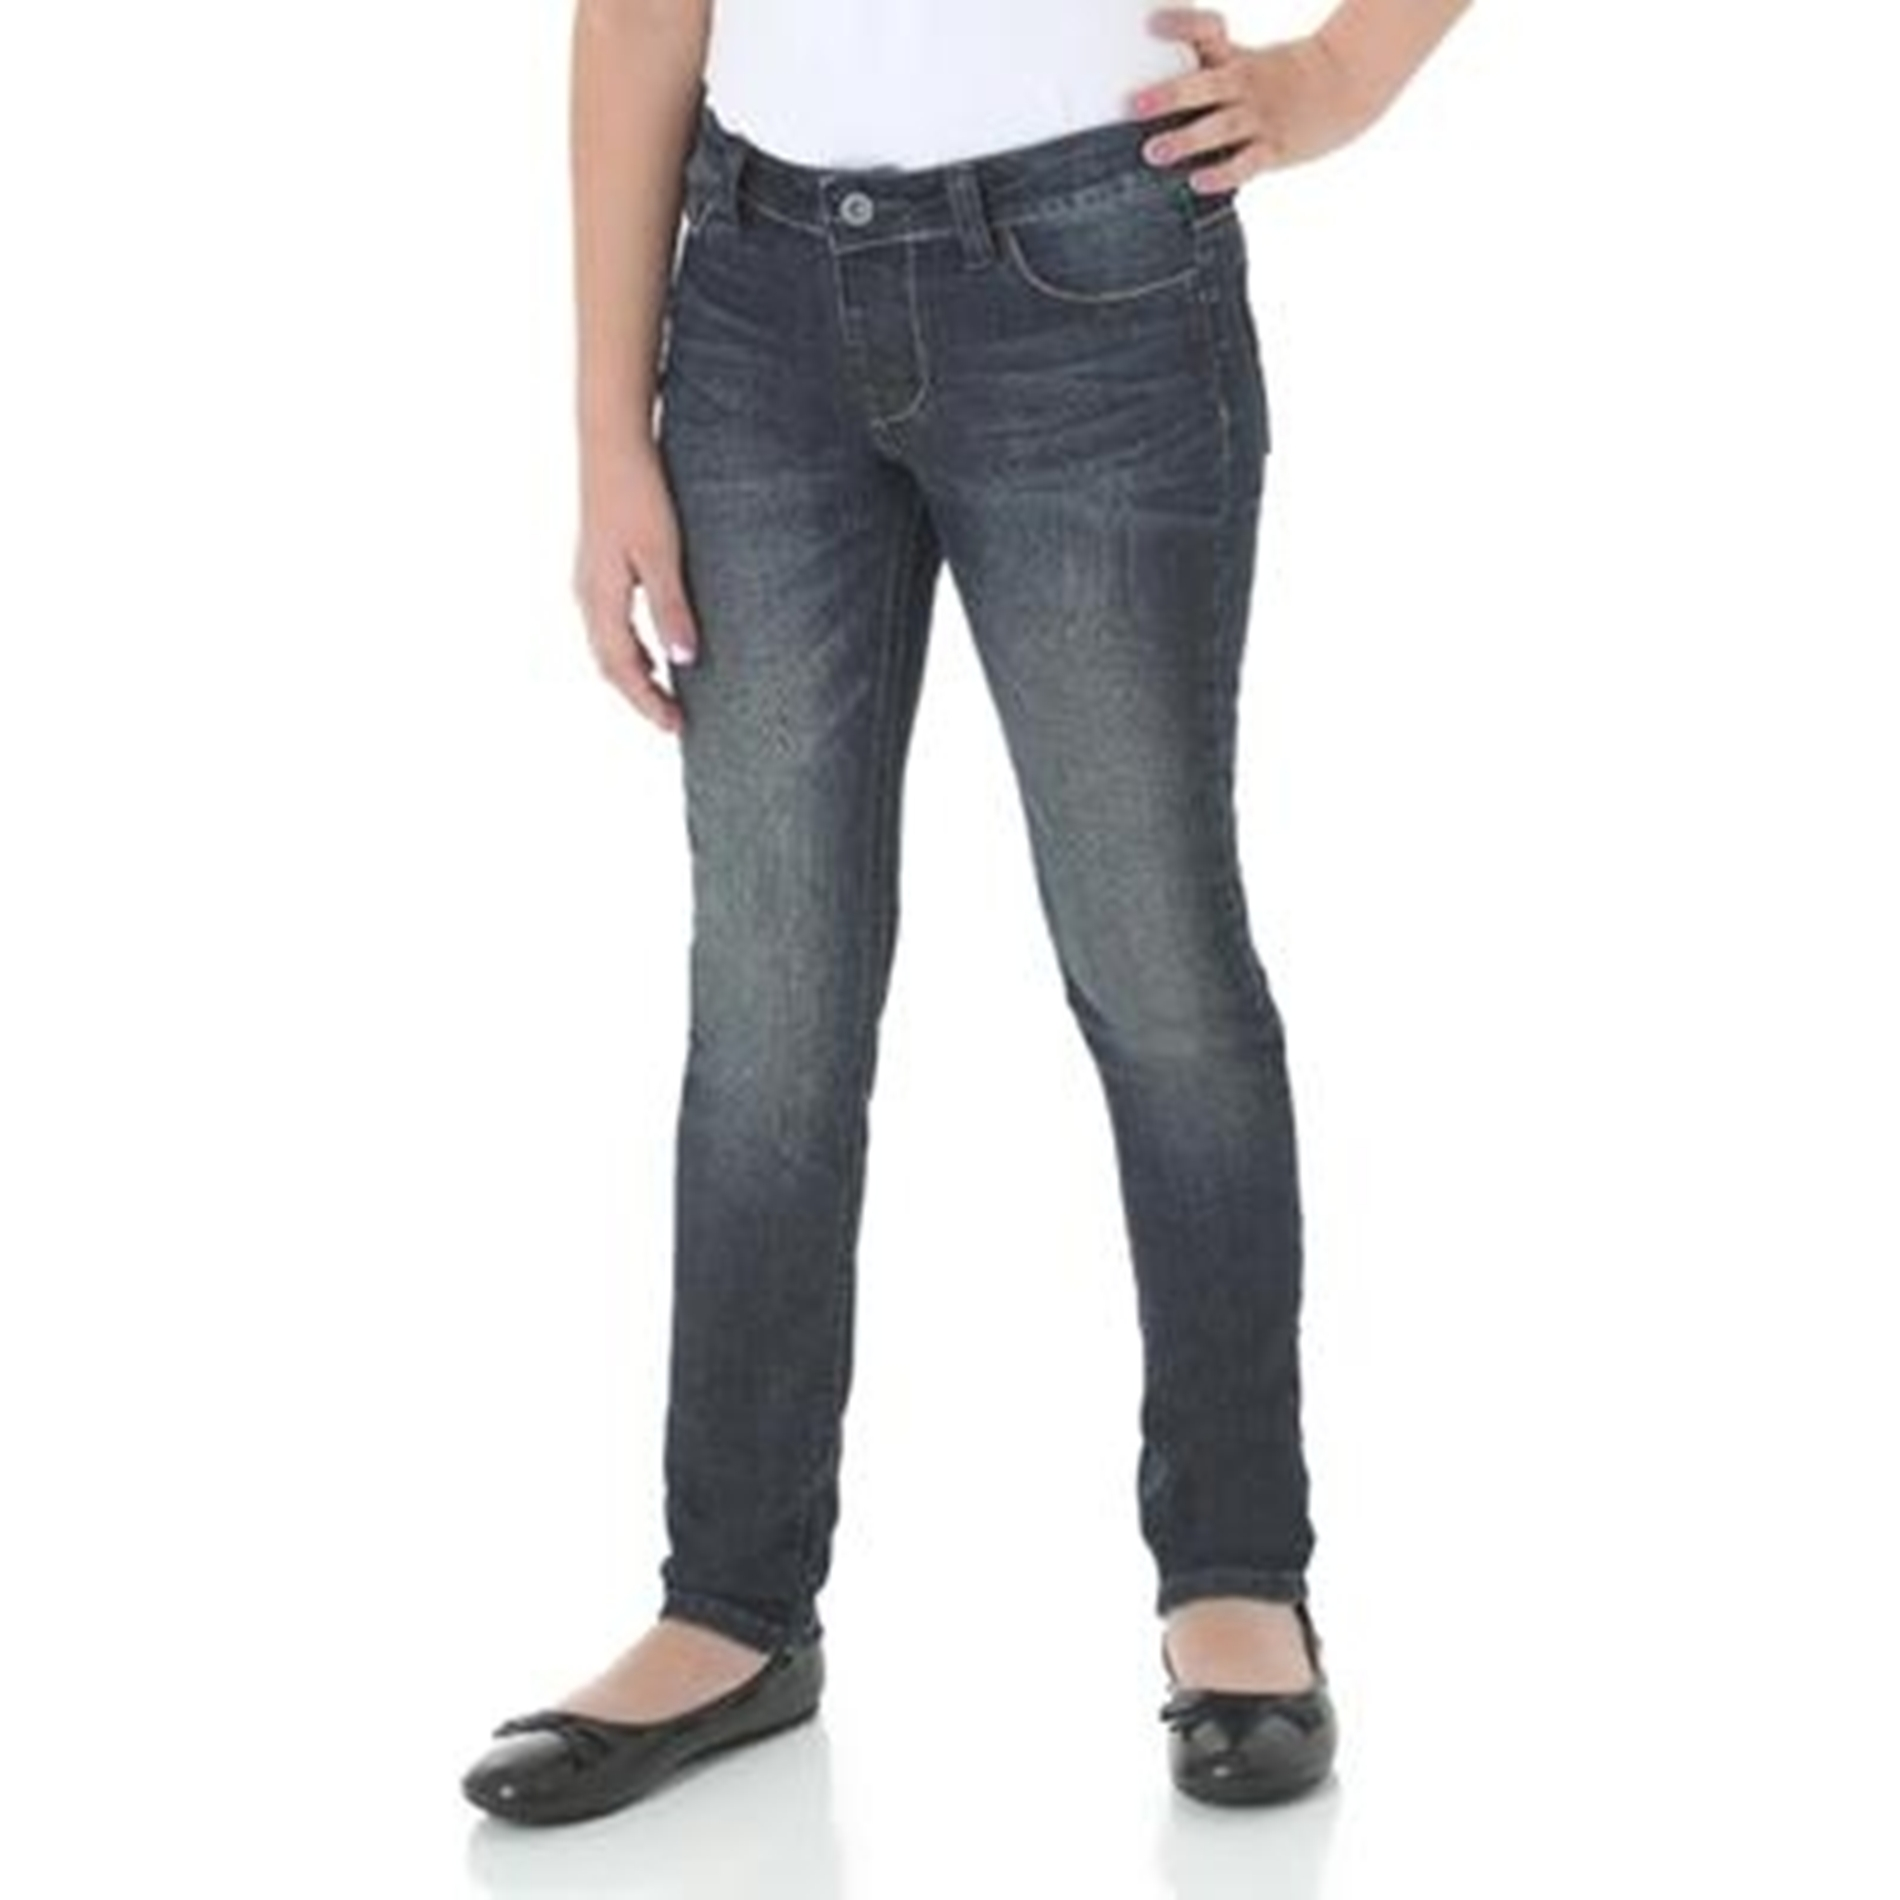 Wrangler Girl Five-Pocket Skinny Jeans at Kmart.com